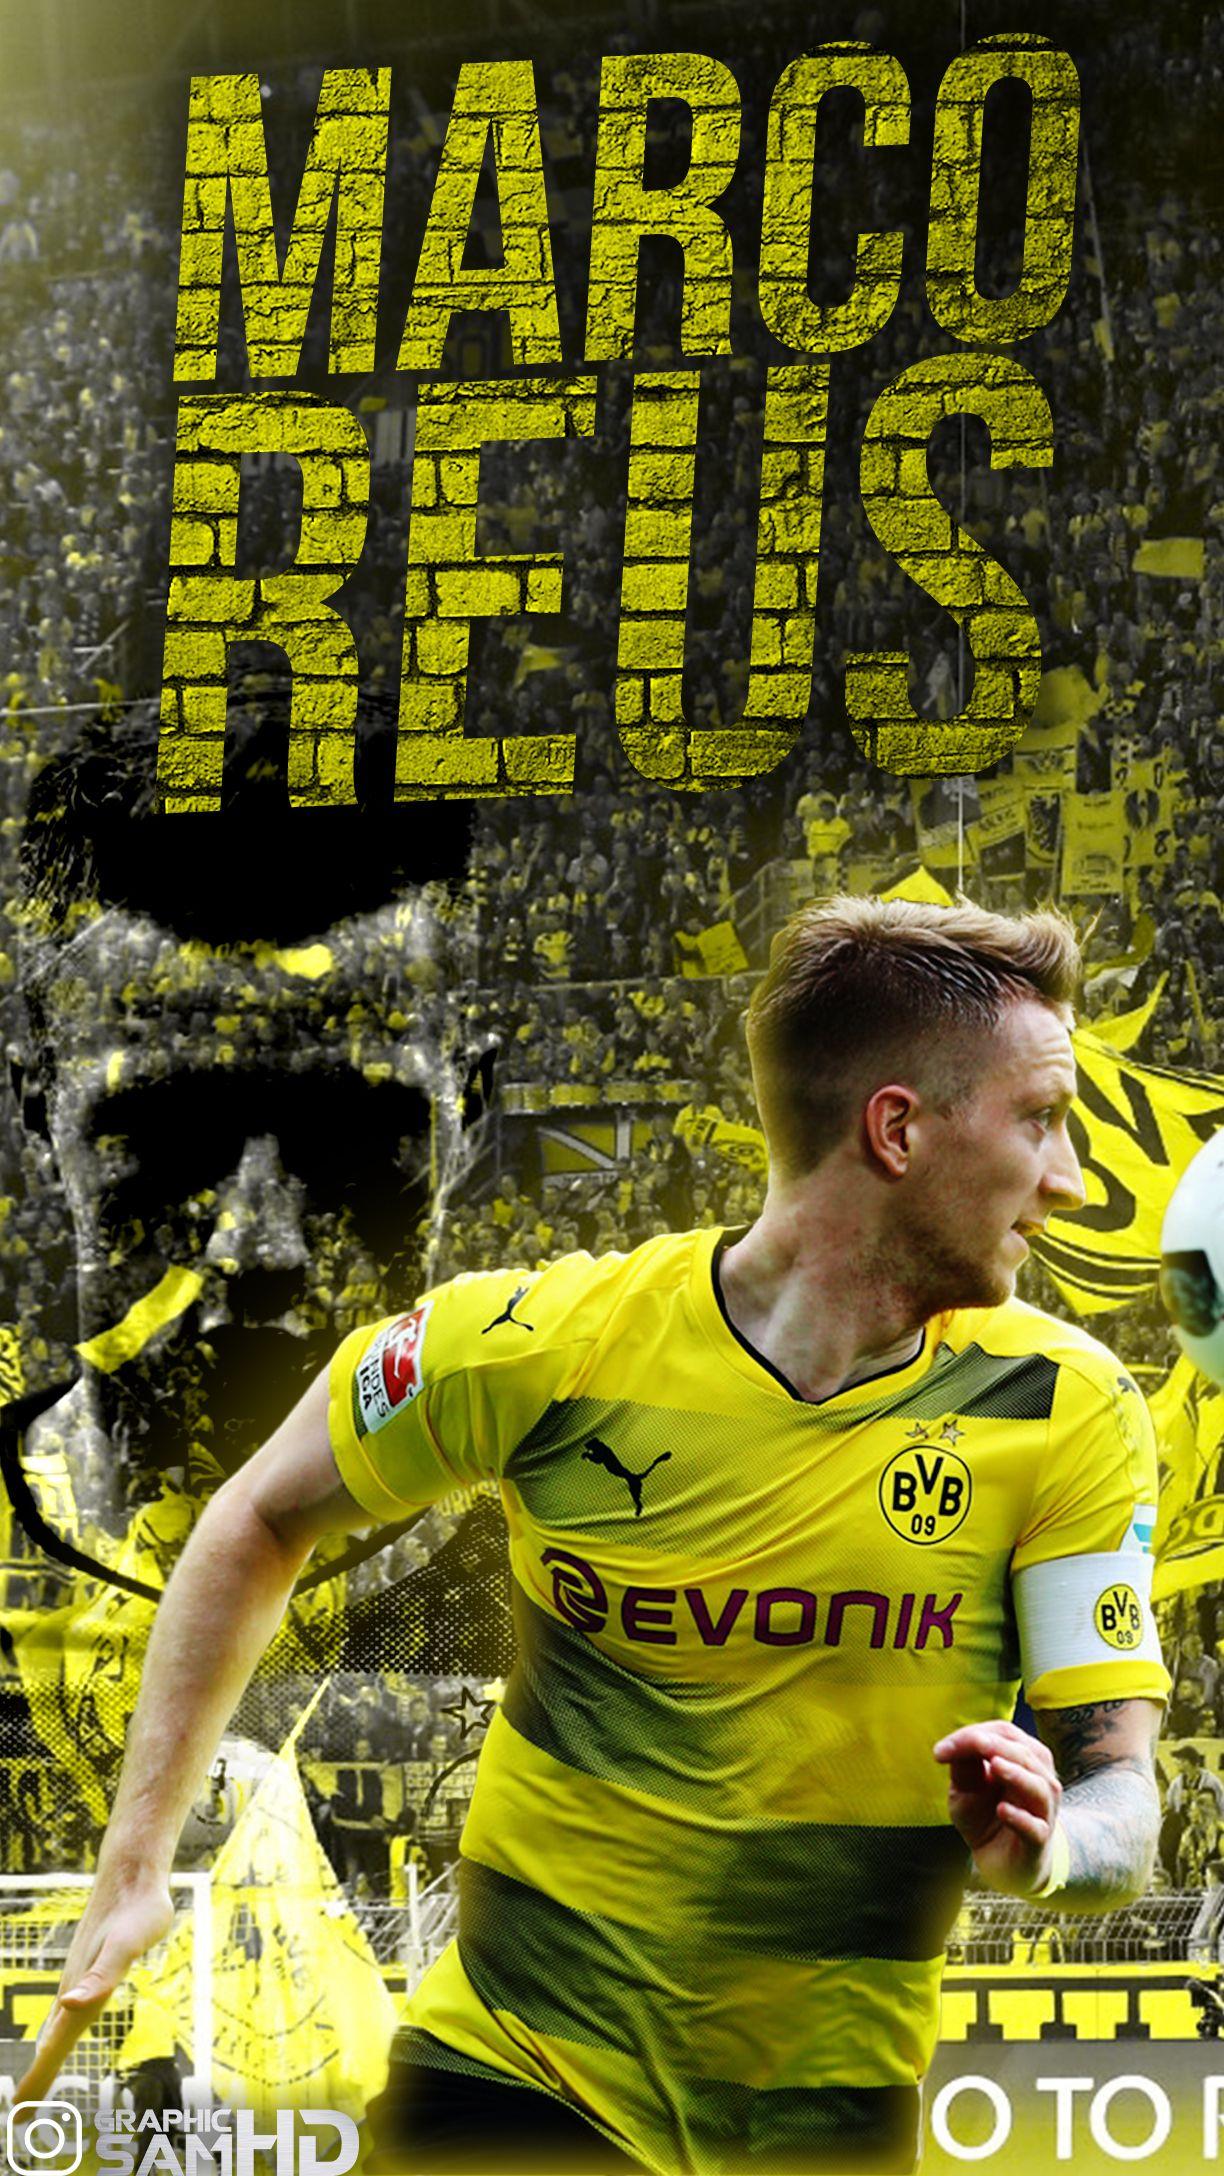 Marco Reus Phone Wallpaper 17 18 Bvb Dortmund Bvb Fussball Dortmund